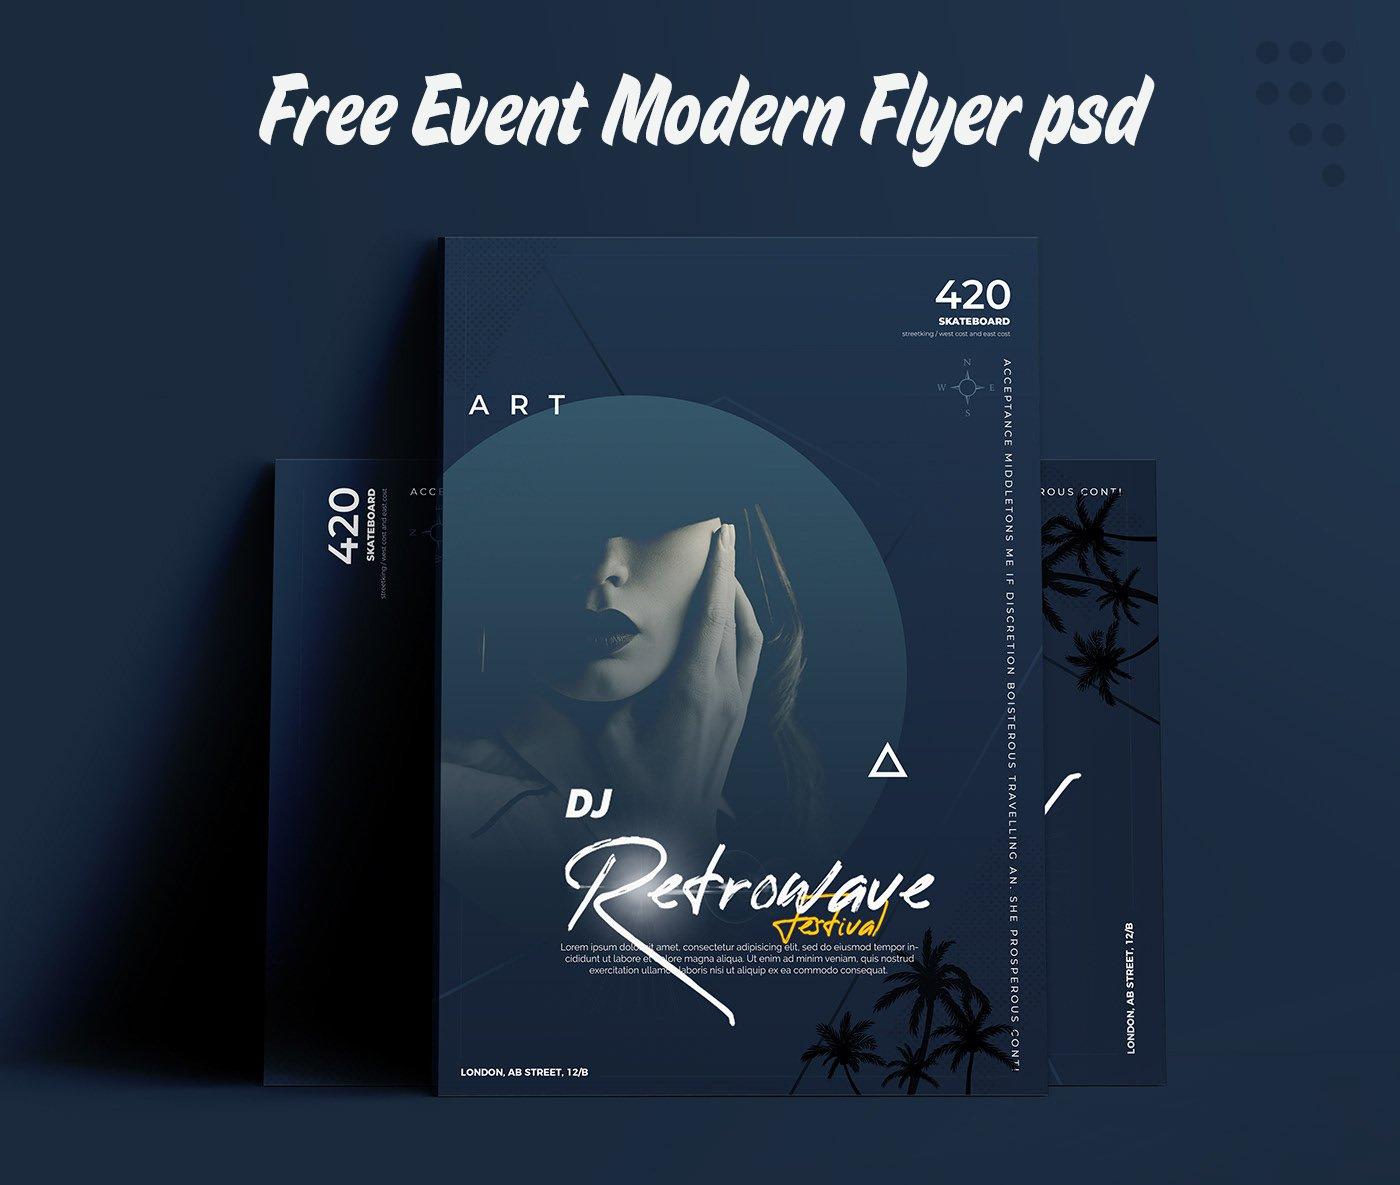 Free Event Modern Flyer скачать